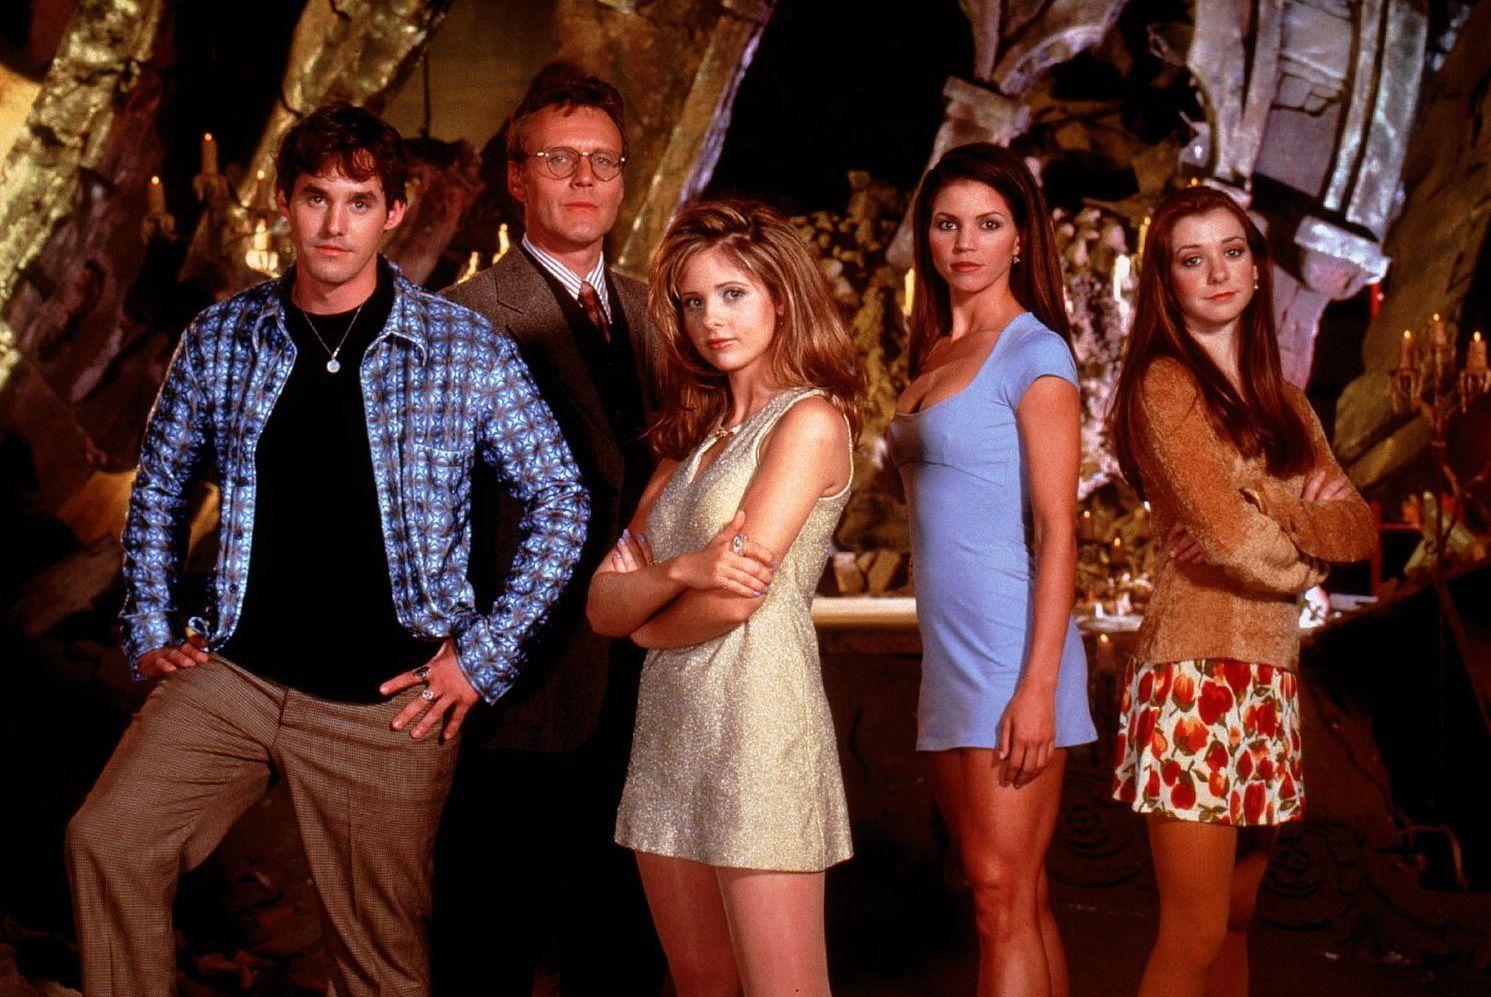 A LOKA DAS SÉRIES | Buffy the Vampire Slayer